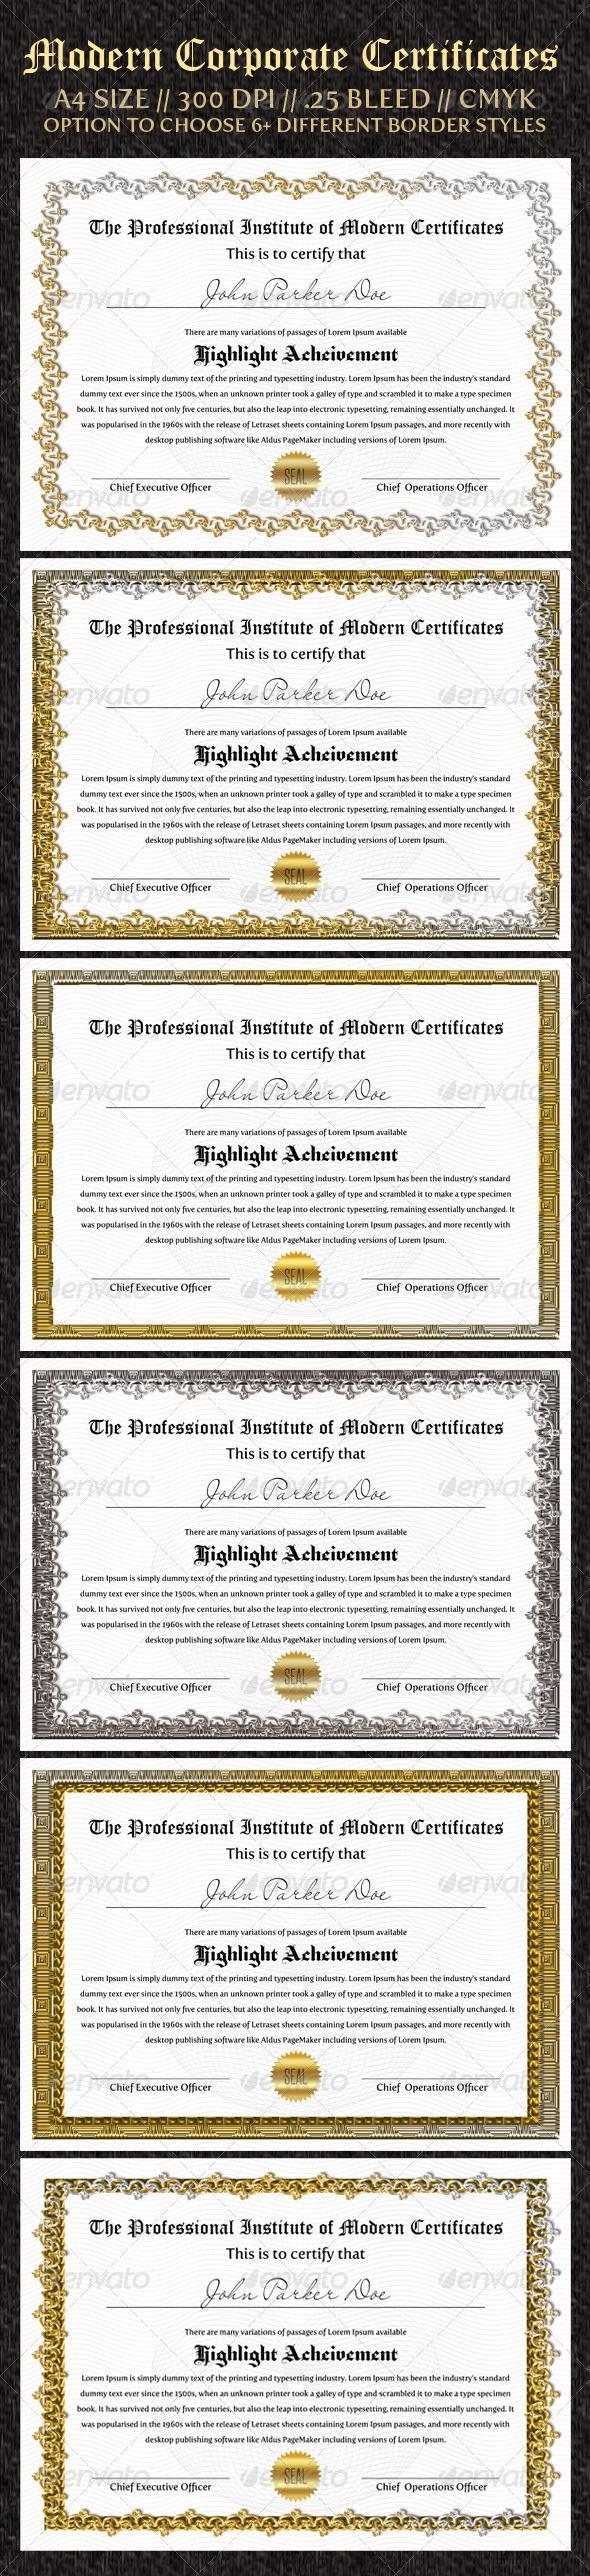 Download Corporate Certificates Print Design Template